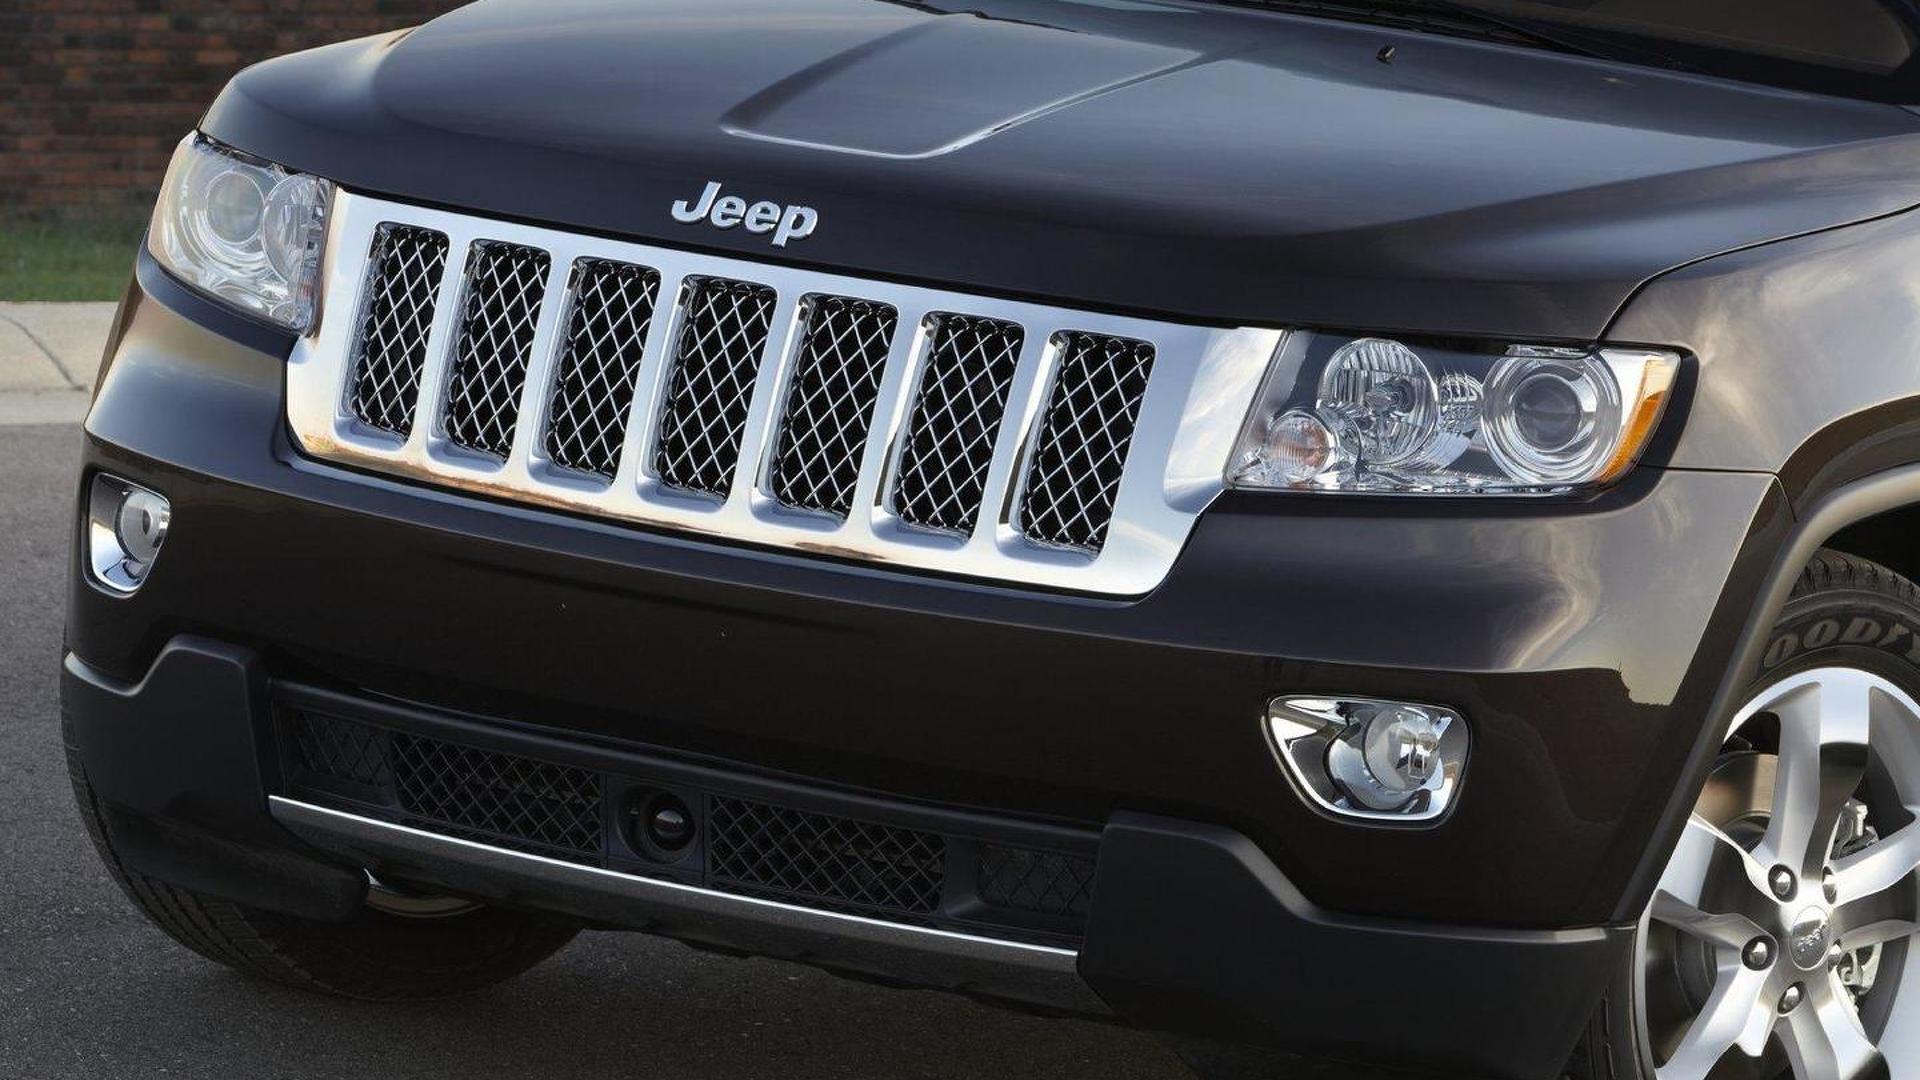 2011 Jeep Grand Cherokee Overland Summit 17 11 2010 403149